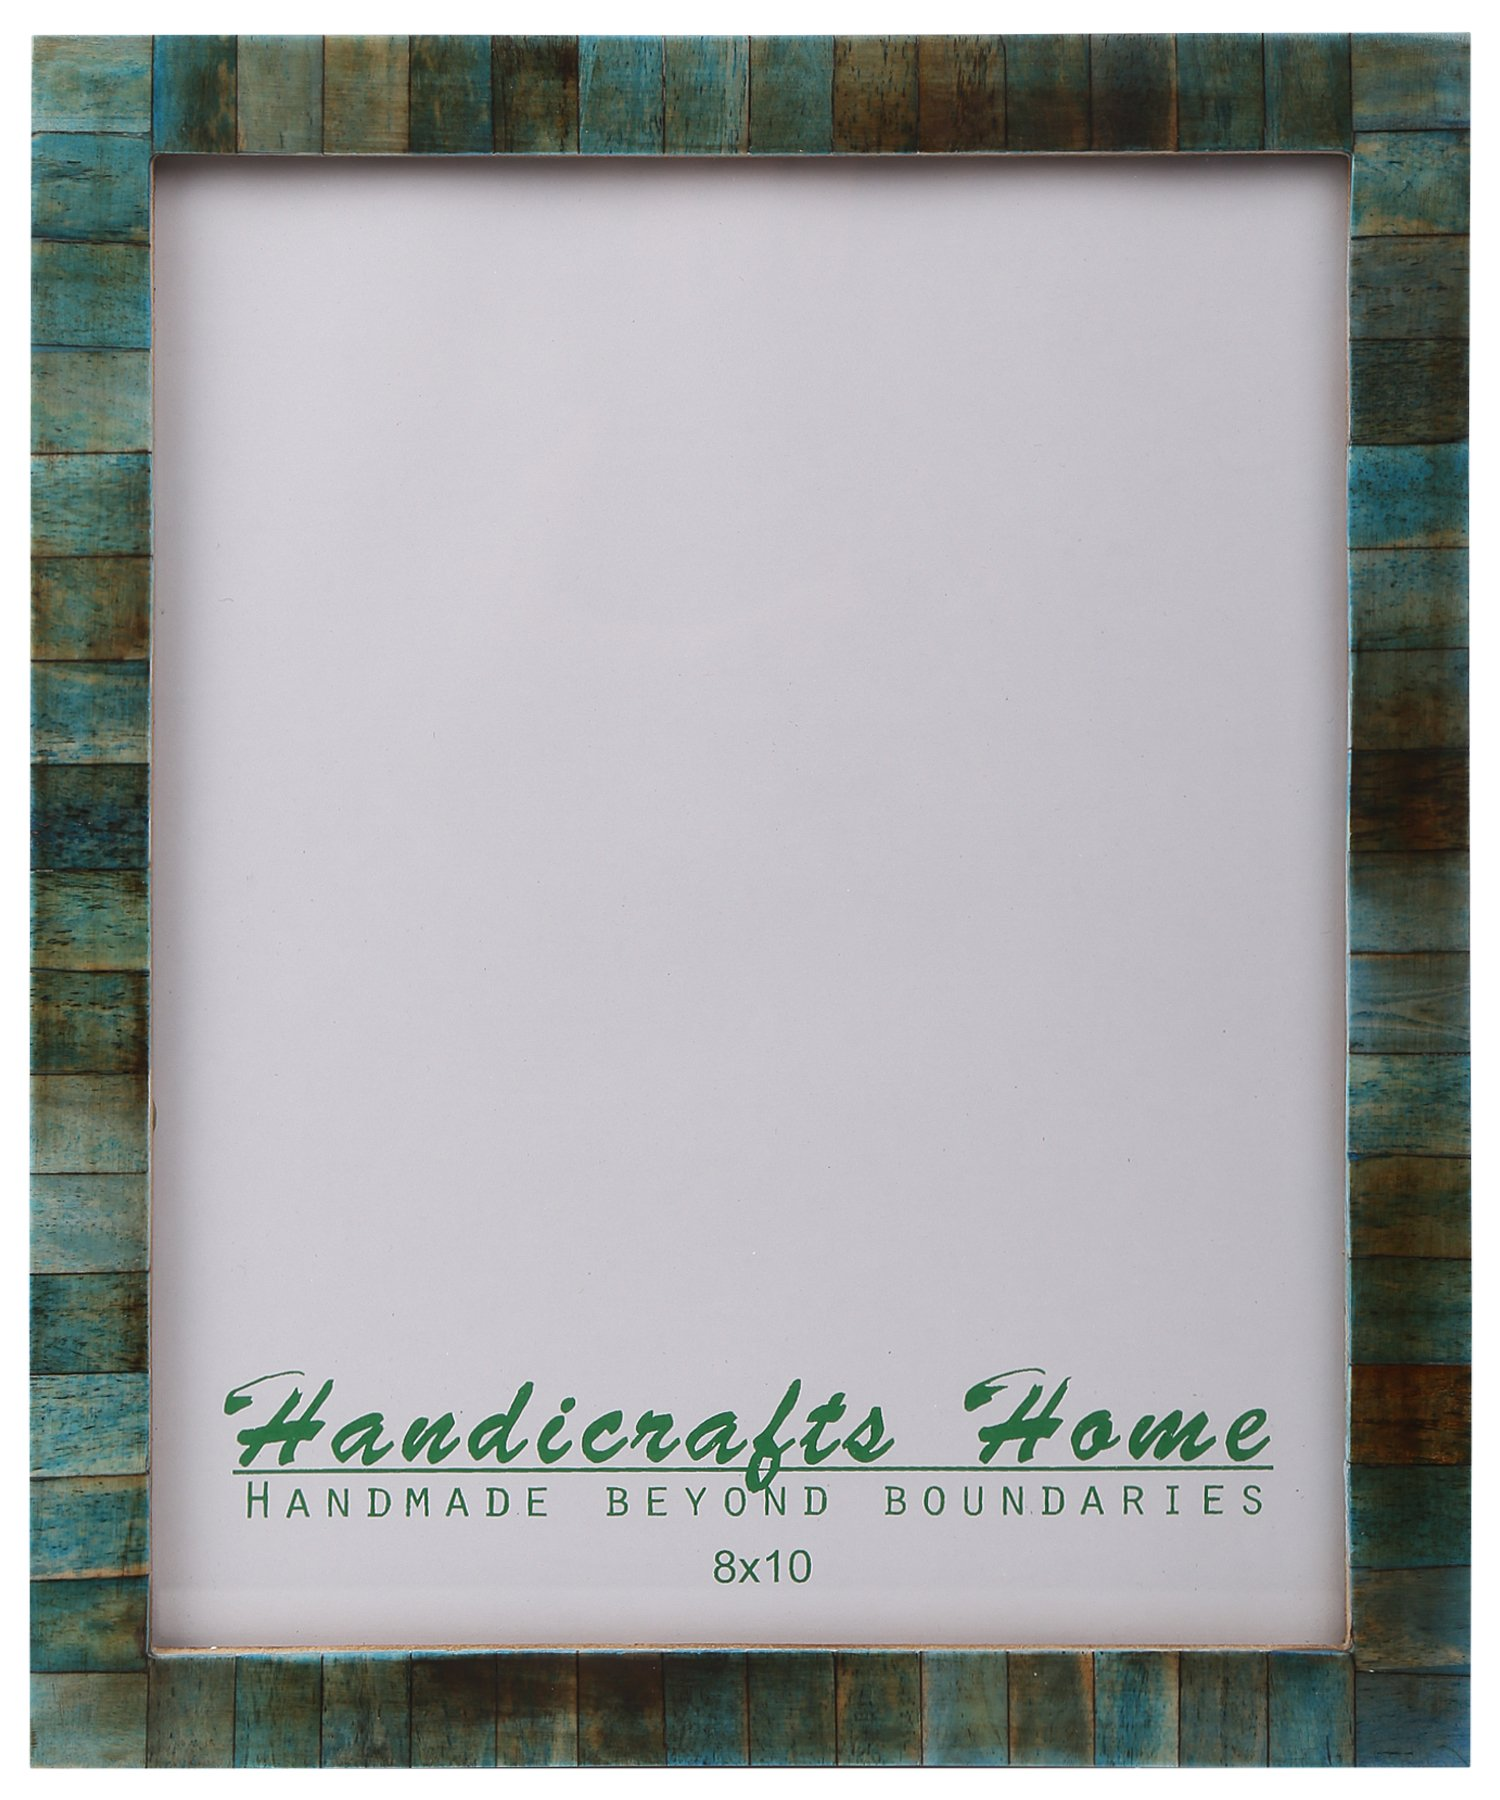 Handicrafts Home 8x10 Verdigris Bone Picture Frames Chic Photo Frame Handmade Vintage from